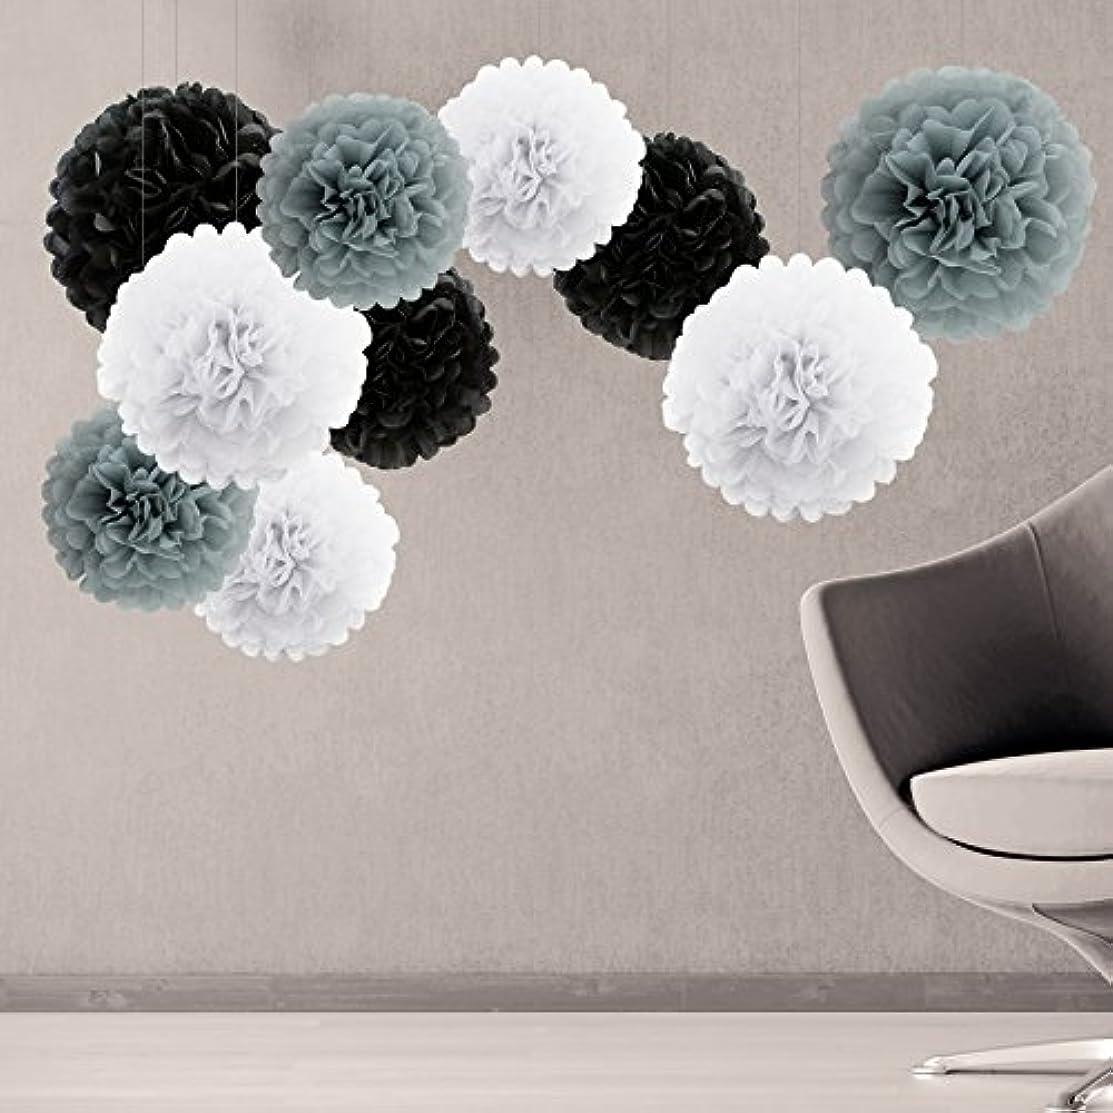 Tissue Paper Pom Poms Flower Party Decorations Set of 10 White Gray Black Pack 10